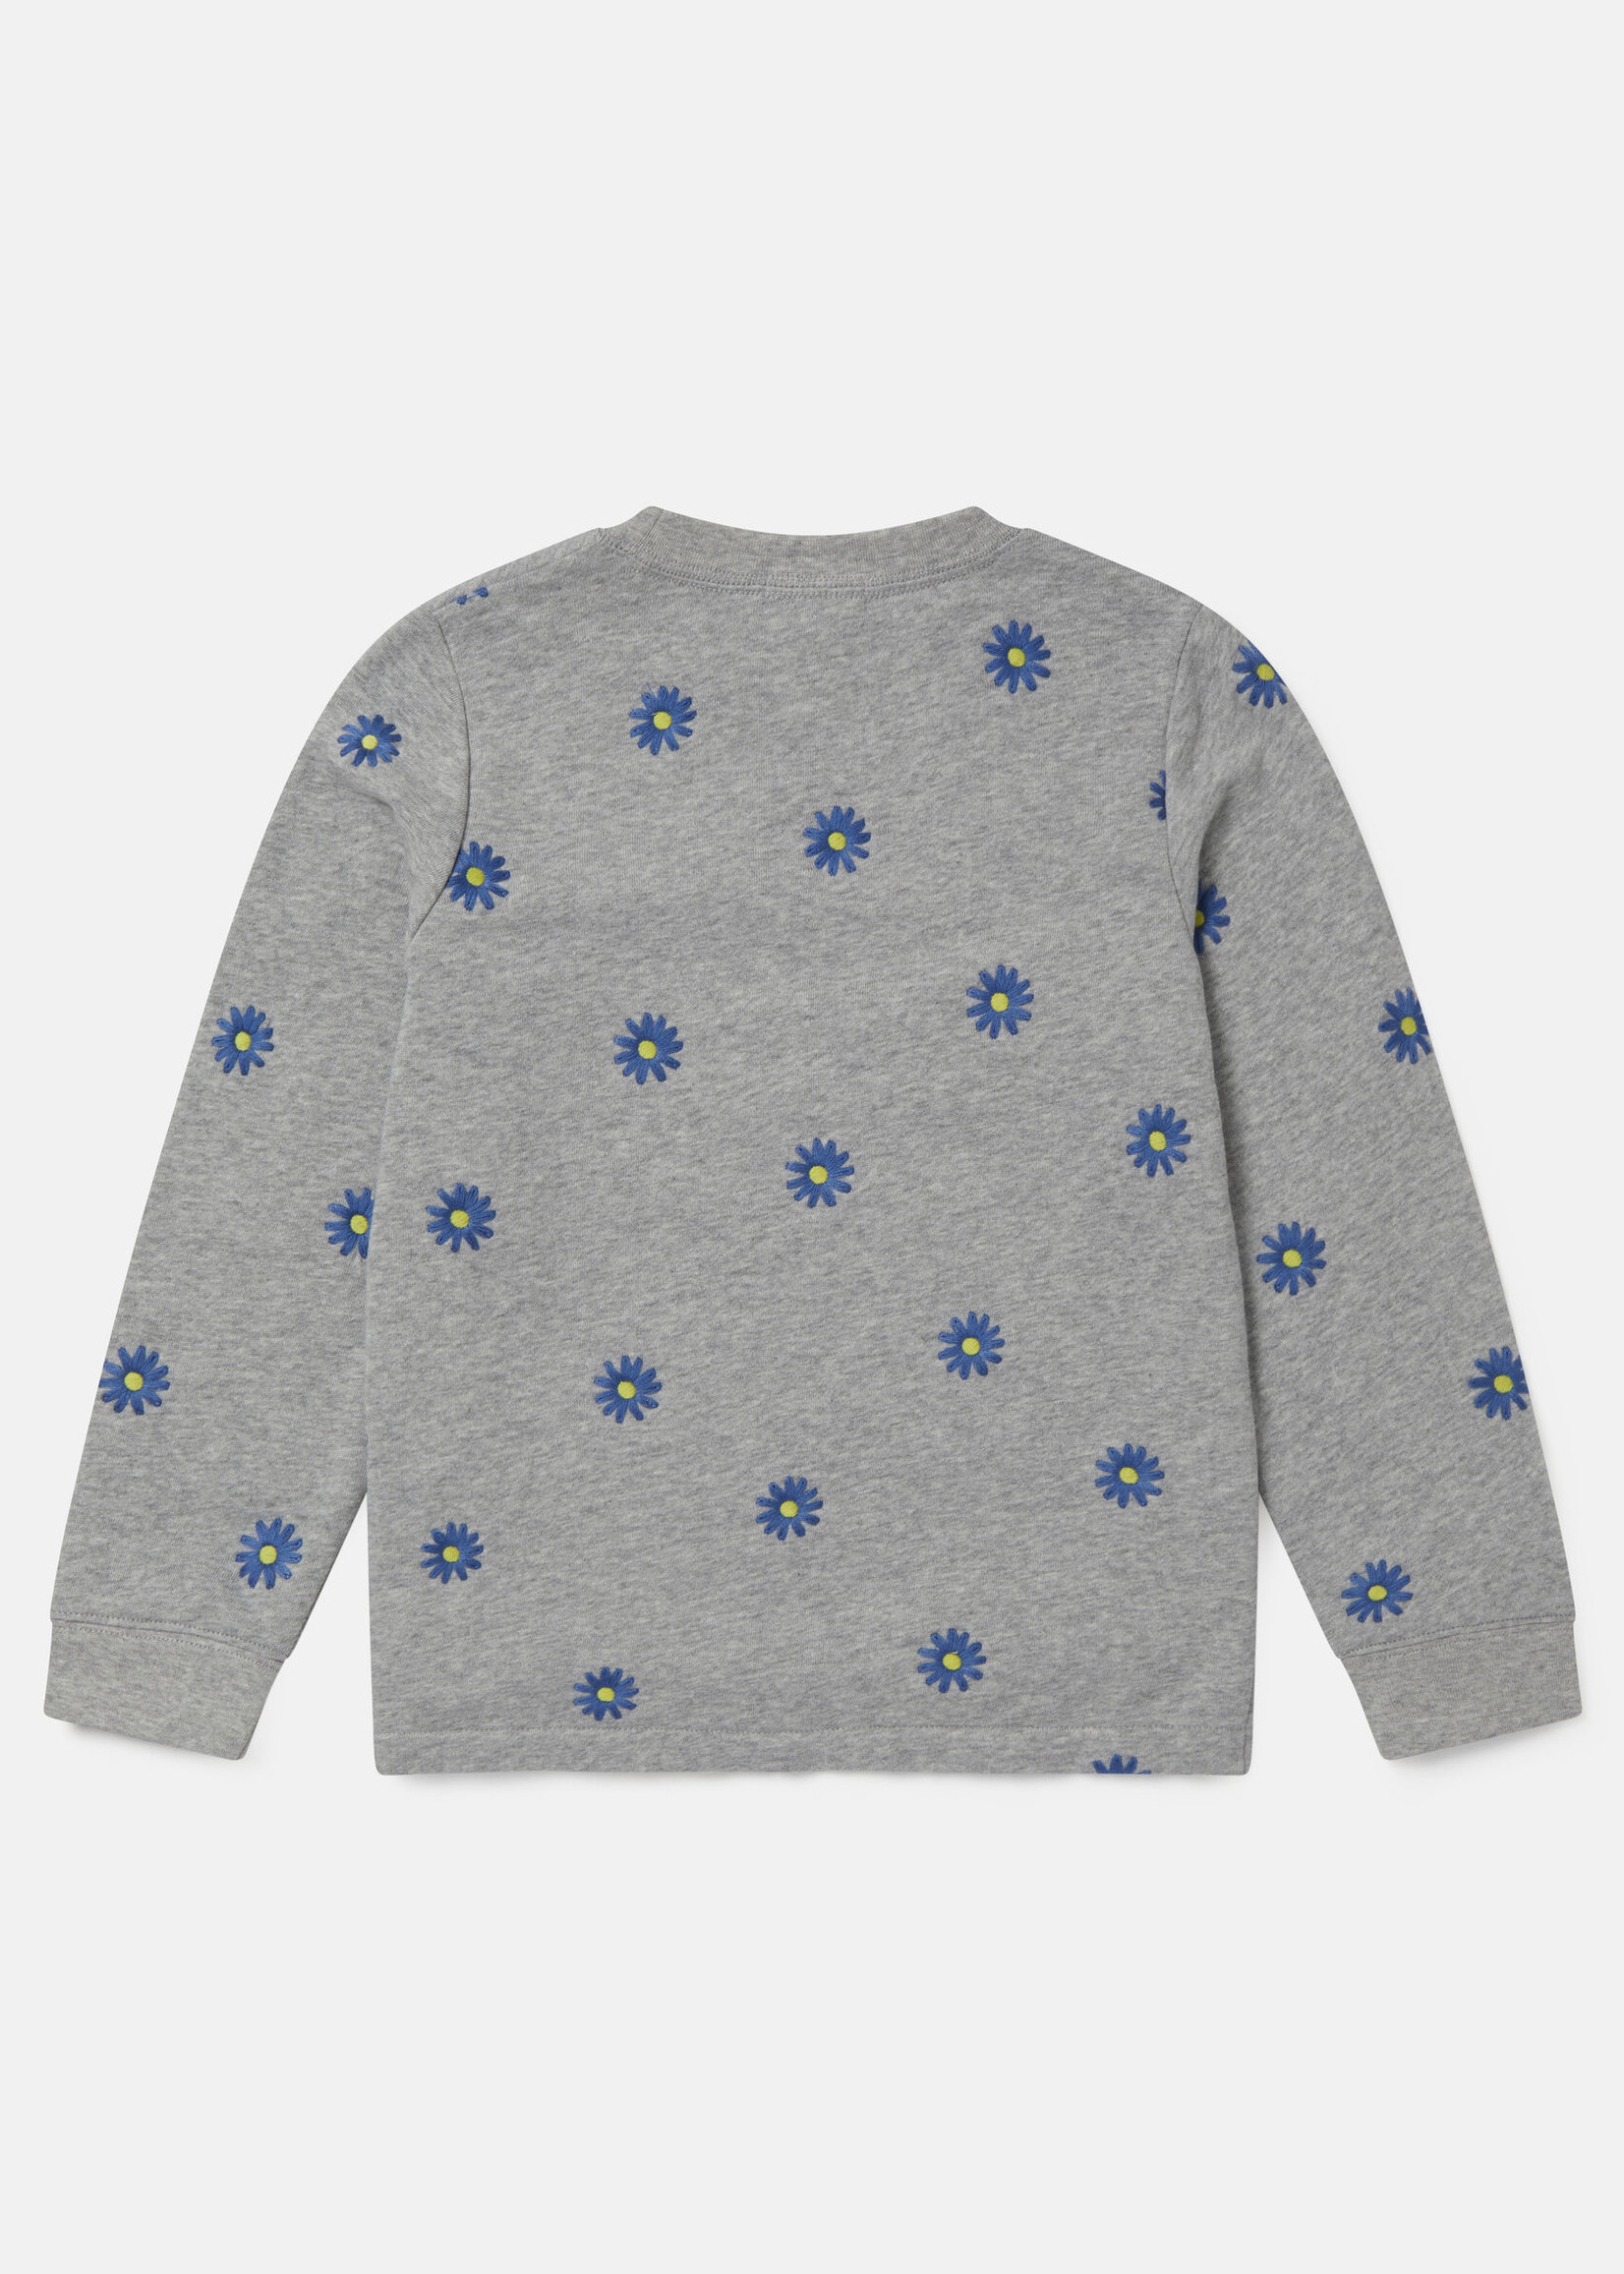 Stella McCartney Stella Mccartney-SS21 602643 Embroidered Daisies Fleece Sweatshirt